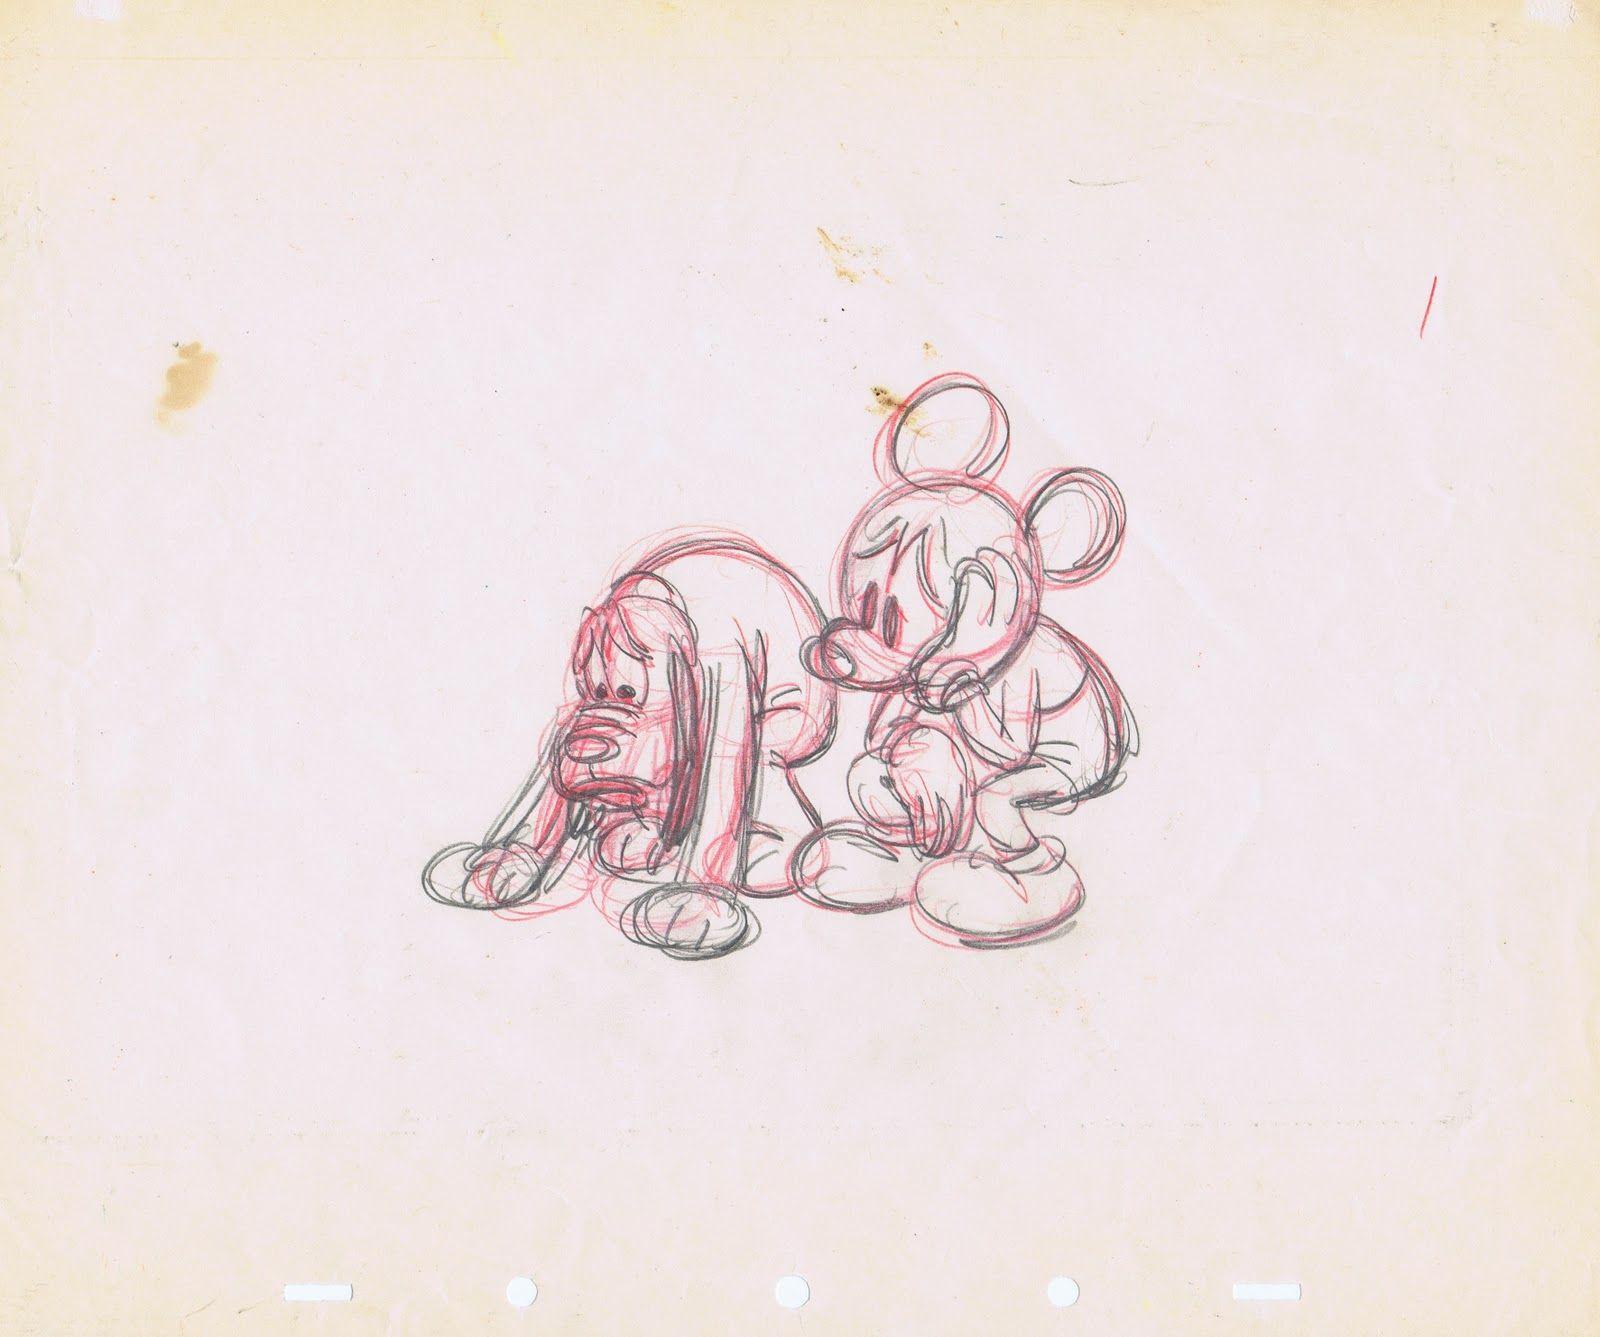 "Photo of Walt Disney Sketches - Pluto & Mickey Mouse for fans of Walt Disney Characters. Walt Disney Sketch of Pluto and Mickey Mouse from the Mickey Mouse Short ""Society Dog Show"" (1939)"